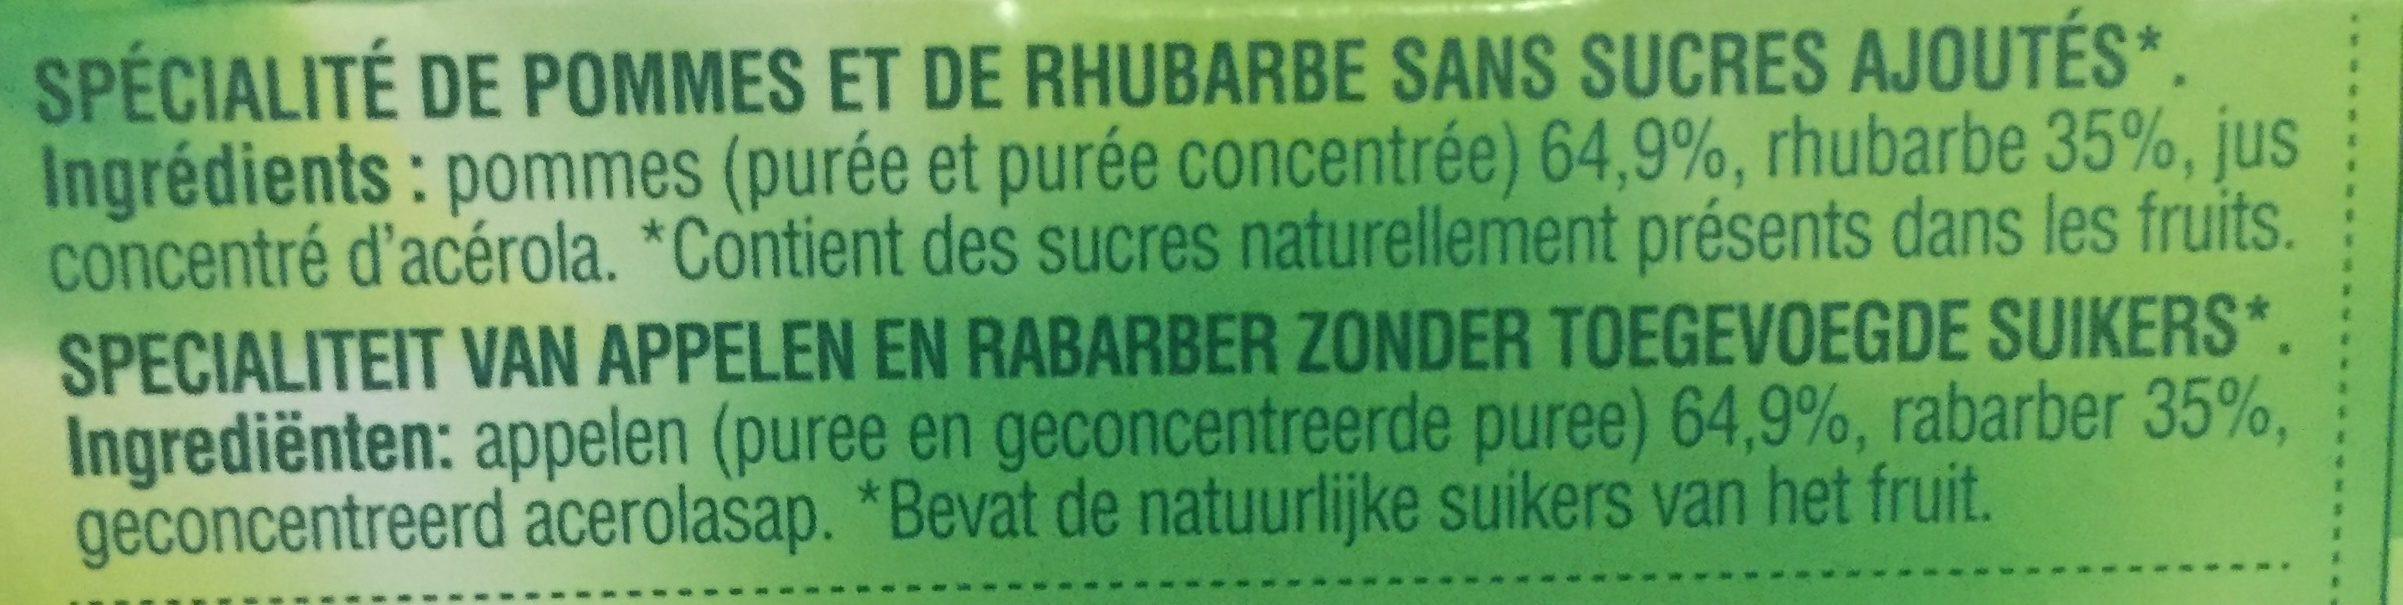 Pomme rhubarbe - Ingrédients - fr